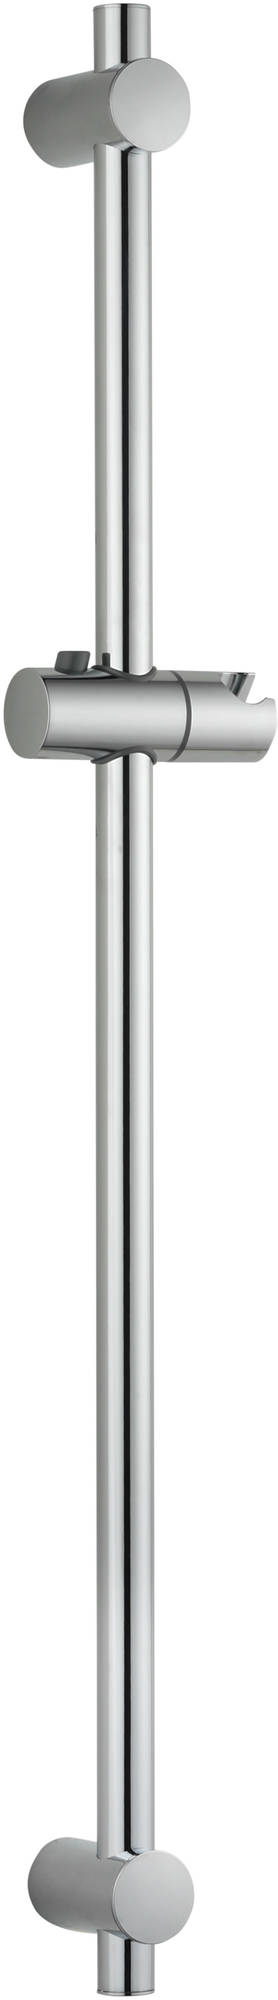 Ben Elan Glijstang rond 85cm Chroom